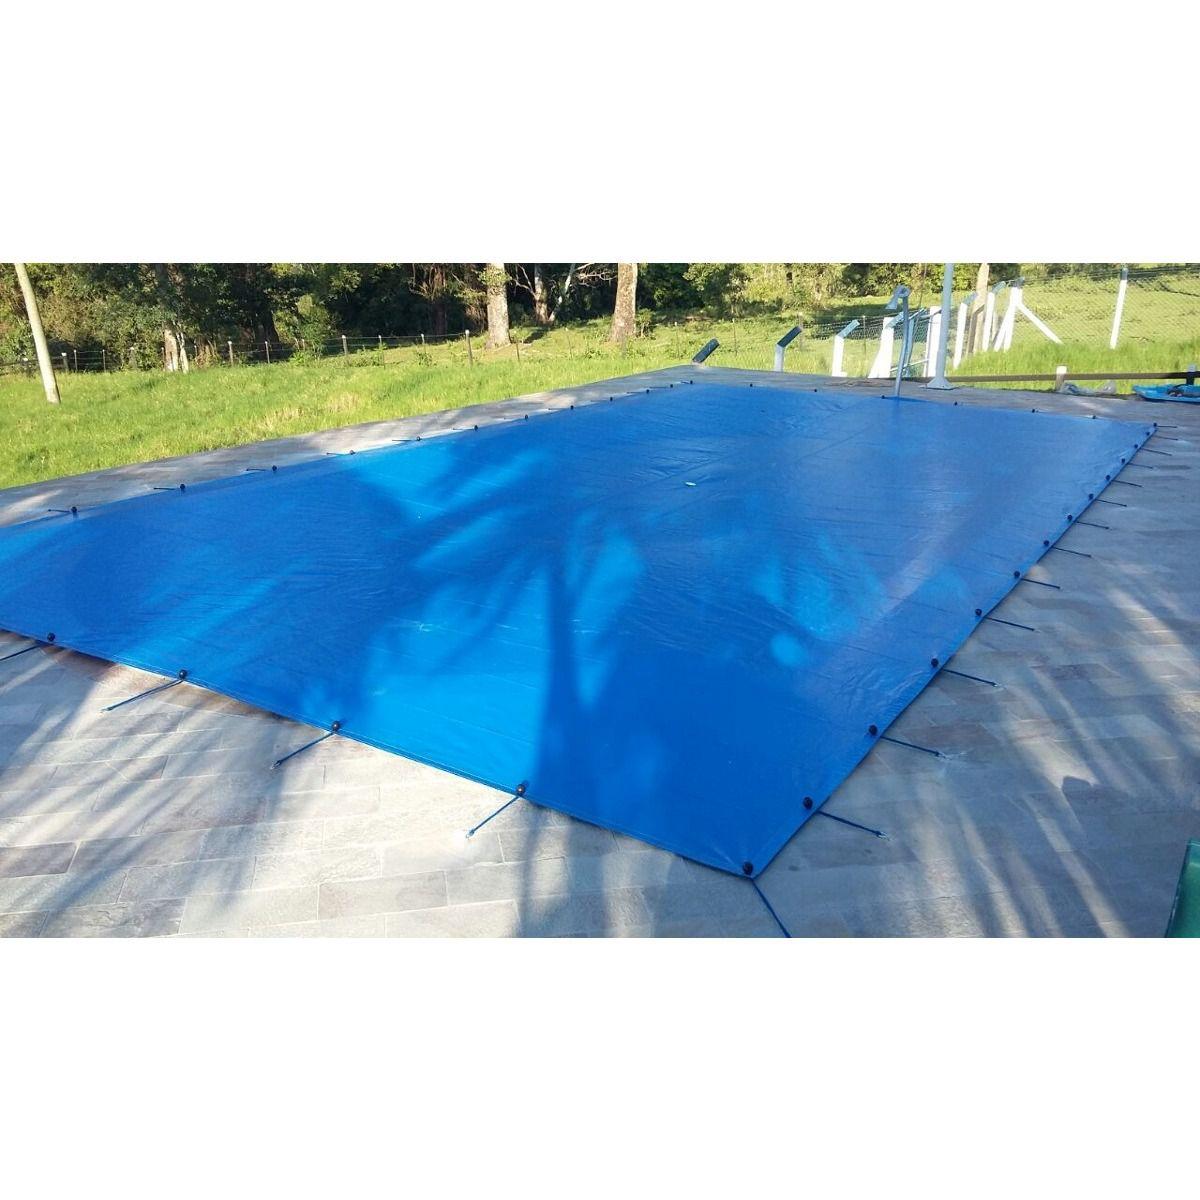 Lona Polietileno Azul 300 Micras - 9,5x5,5